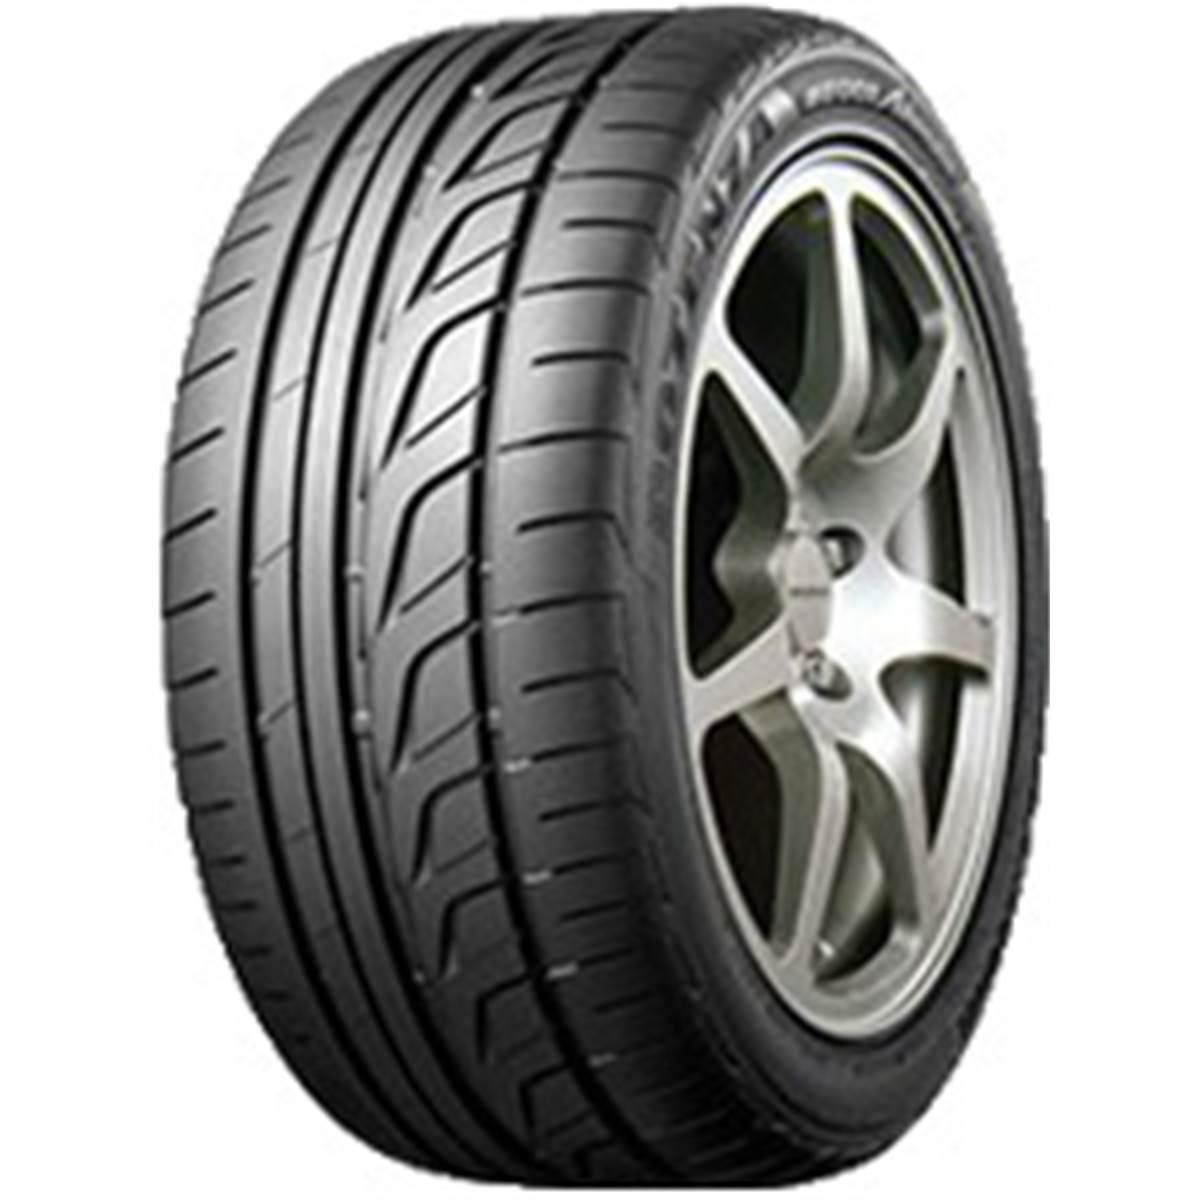 Pneu Bridgestone 195/60R15 88H POTENZA ADRENALIN RE002